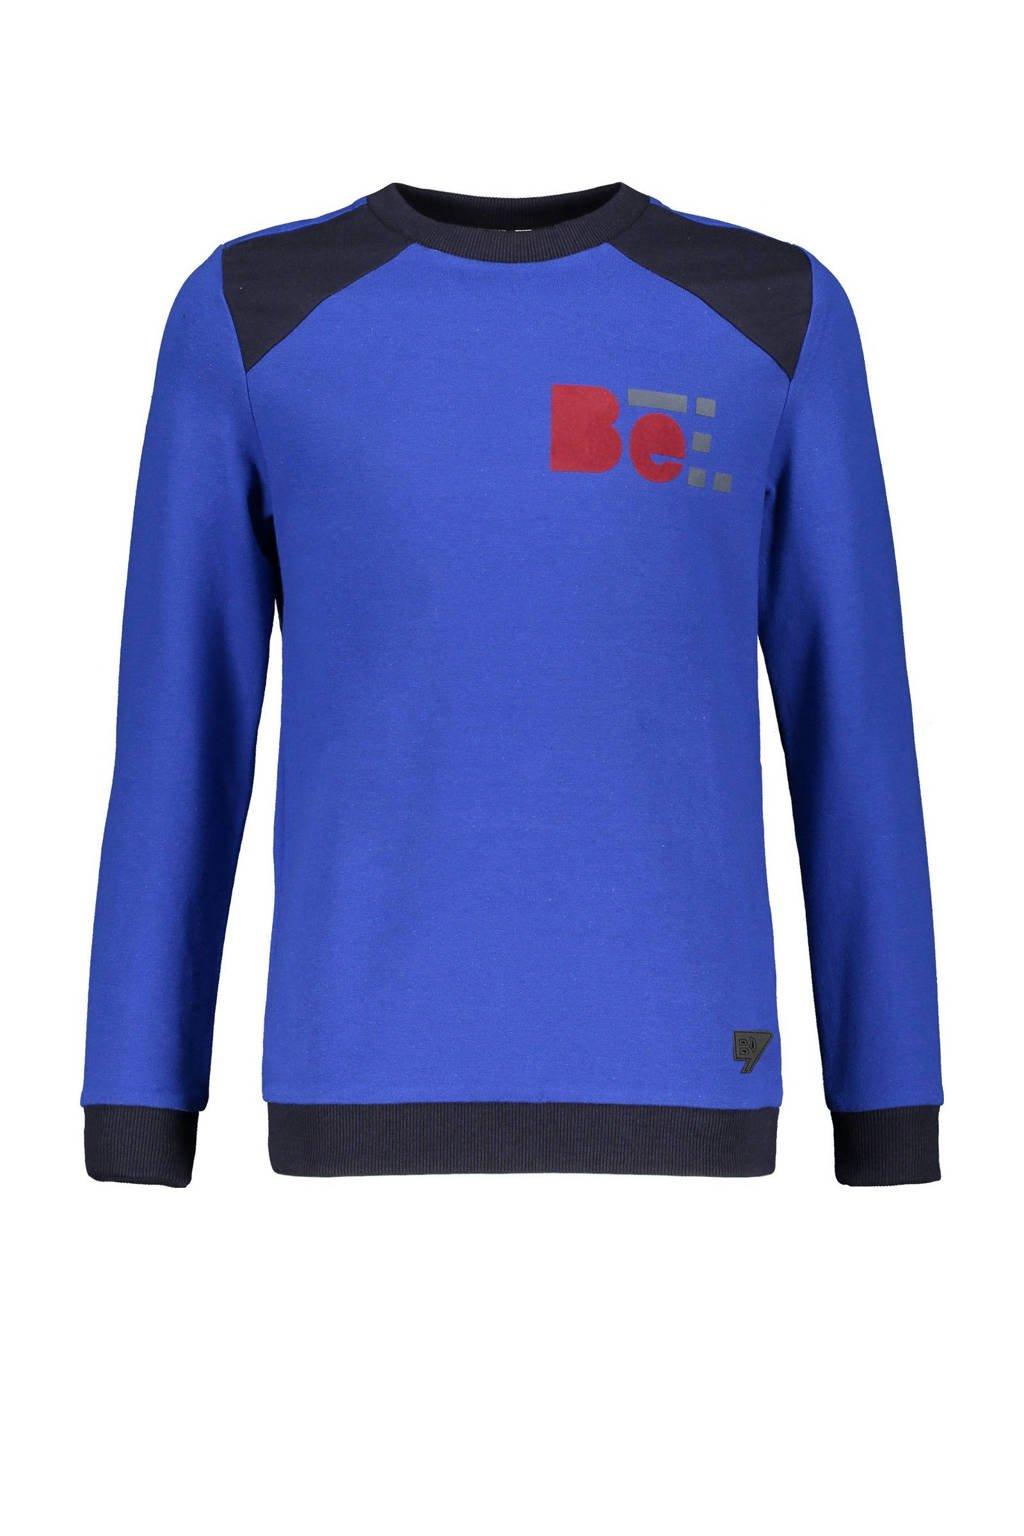 Bellaire longsleeve Kees blauw/donkerblauw/rood, Blauw/donkerblauw/rood